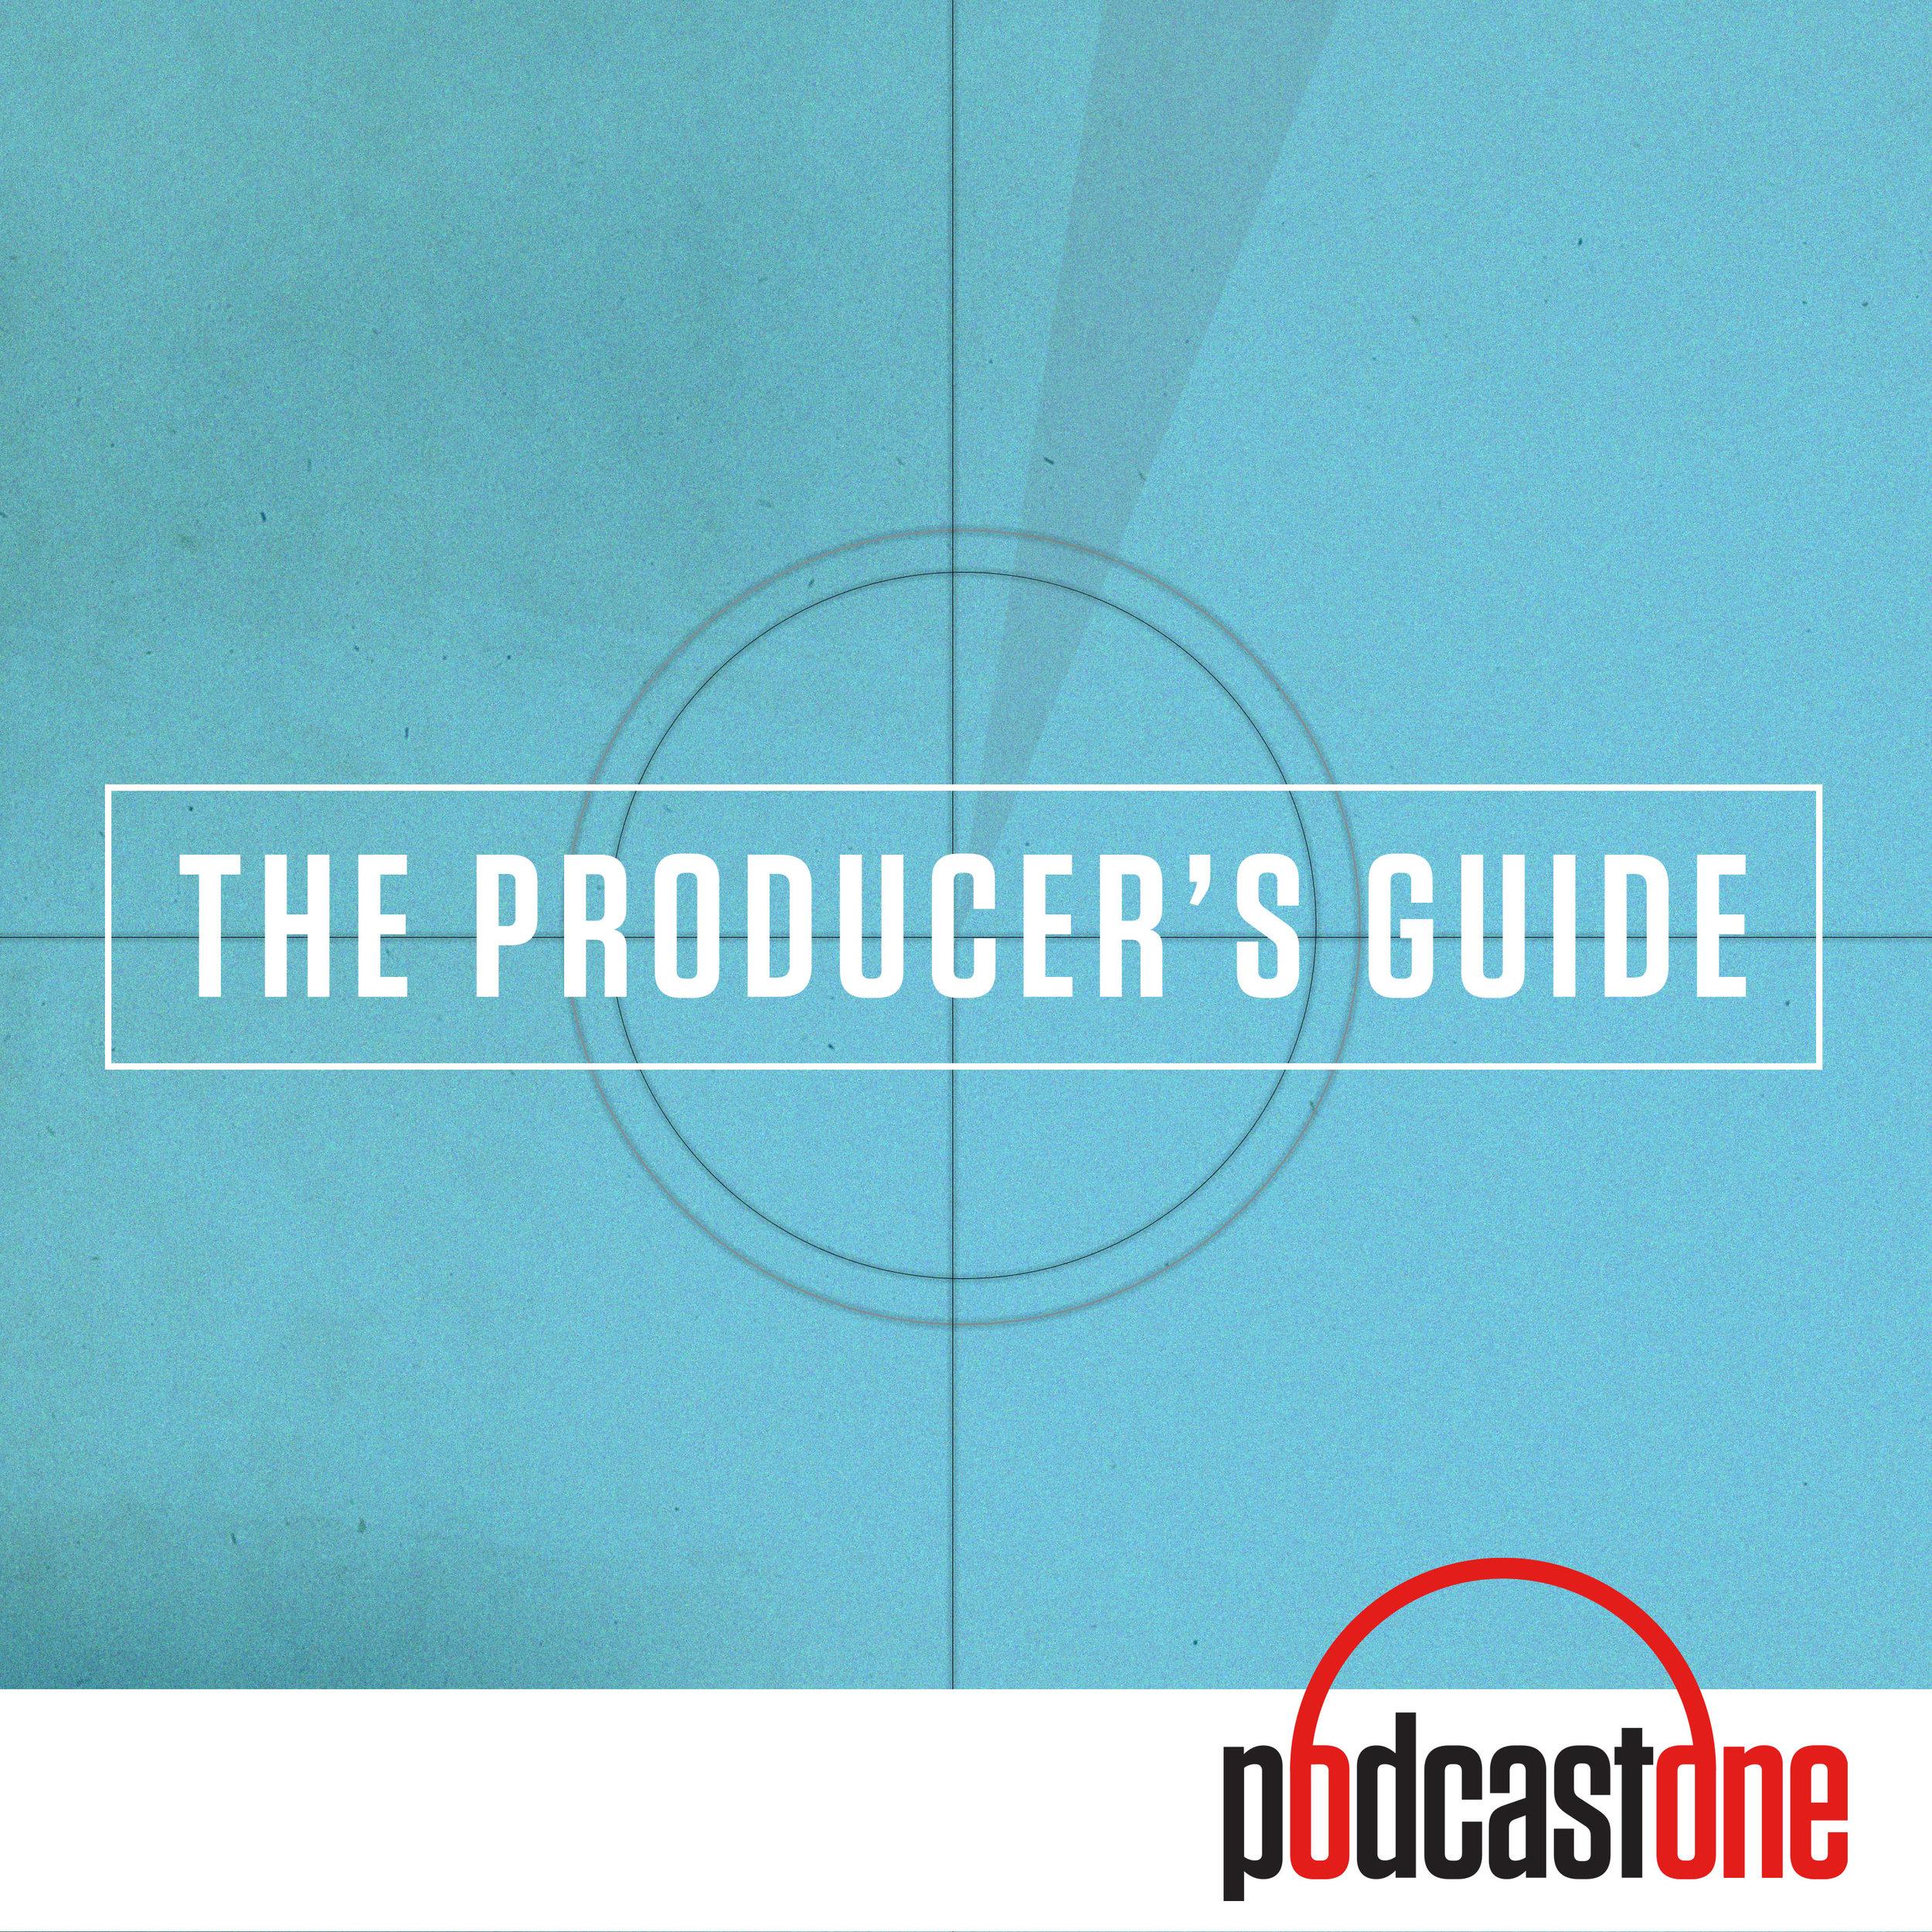 producersguide_logo.jpg